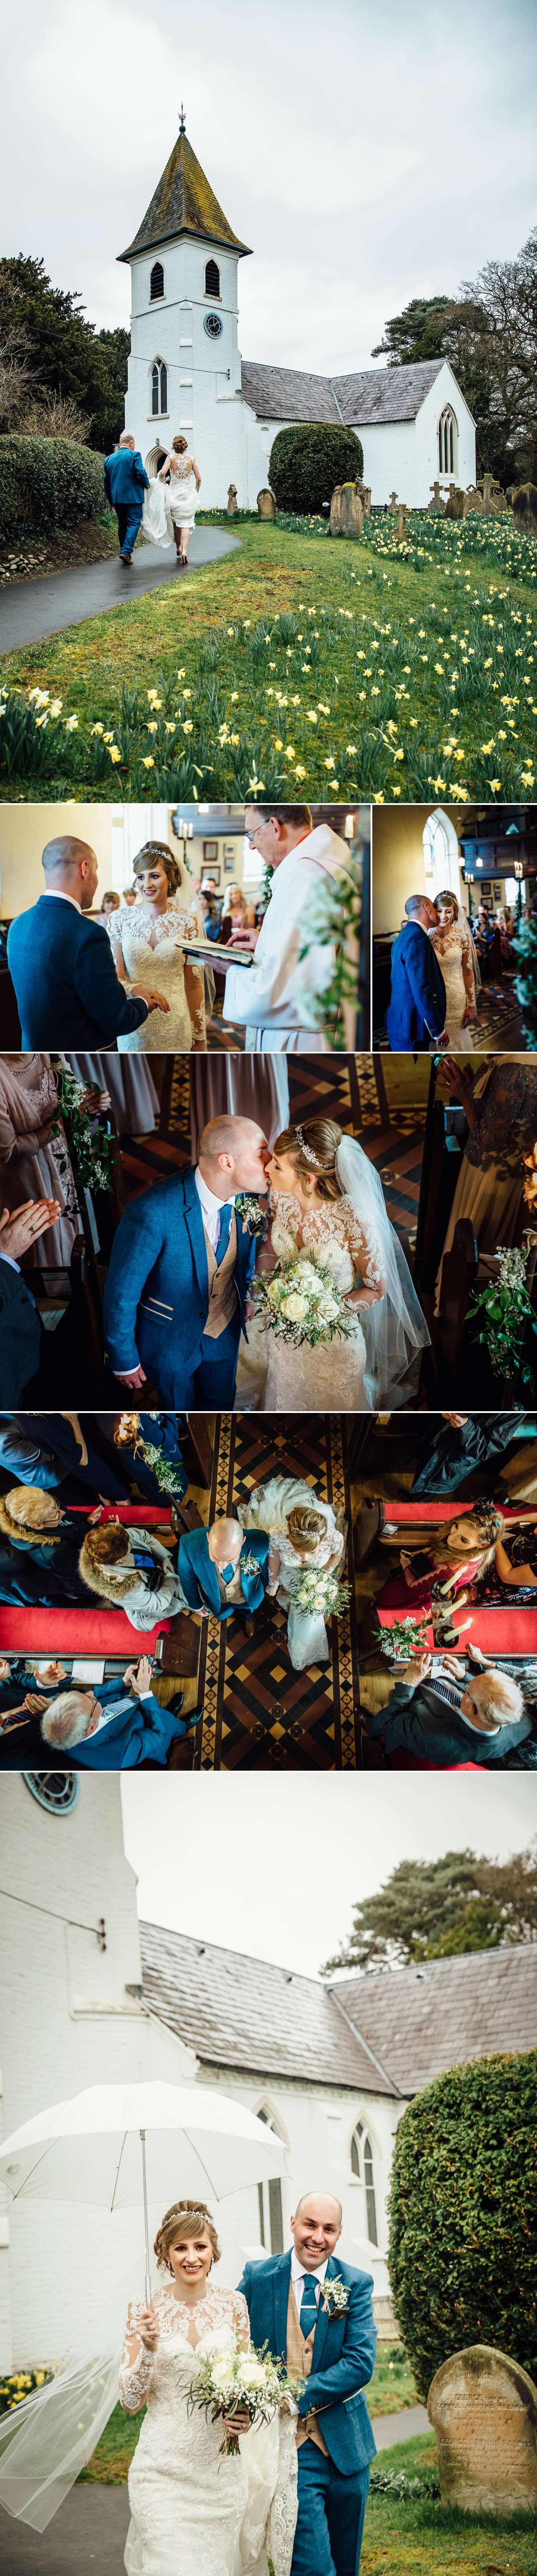 Wedding Ceremony at St Marys Whitwell Church near Iscoyd Park